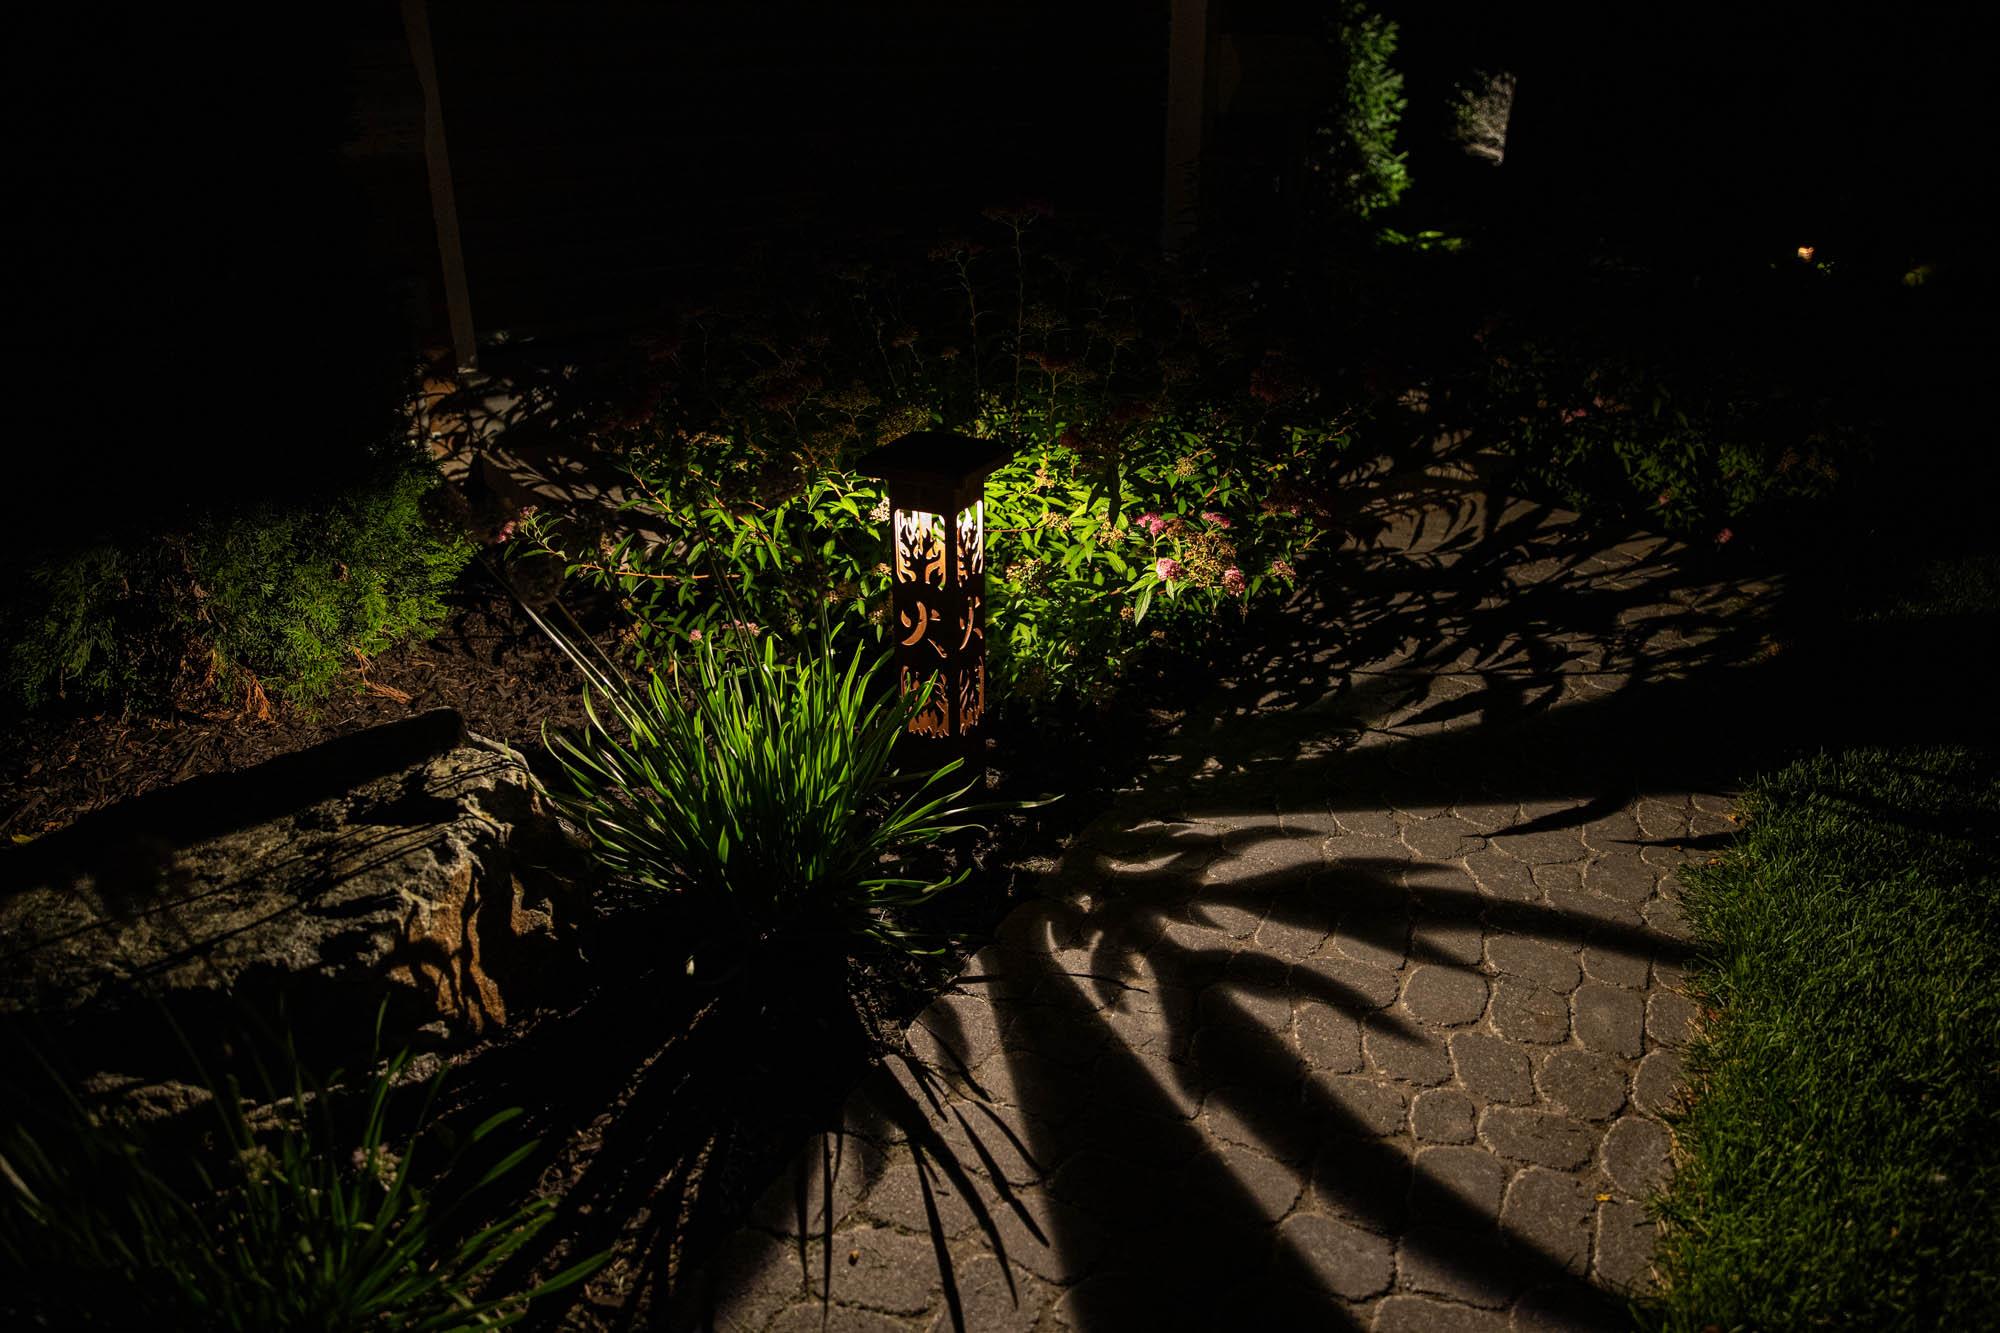 brookfield landscape lighting night owl outdoor lights plants decorate lanterns